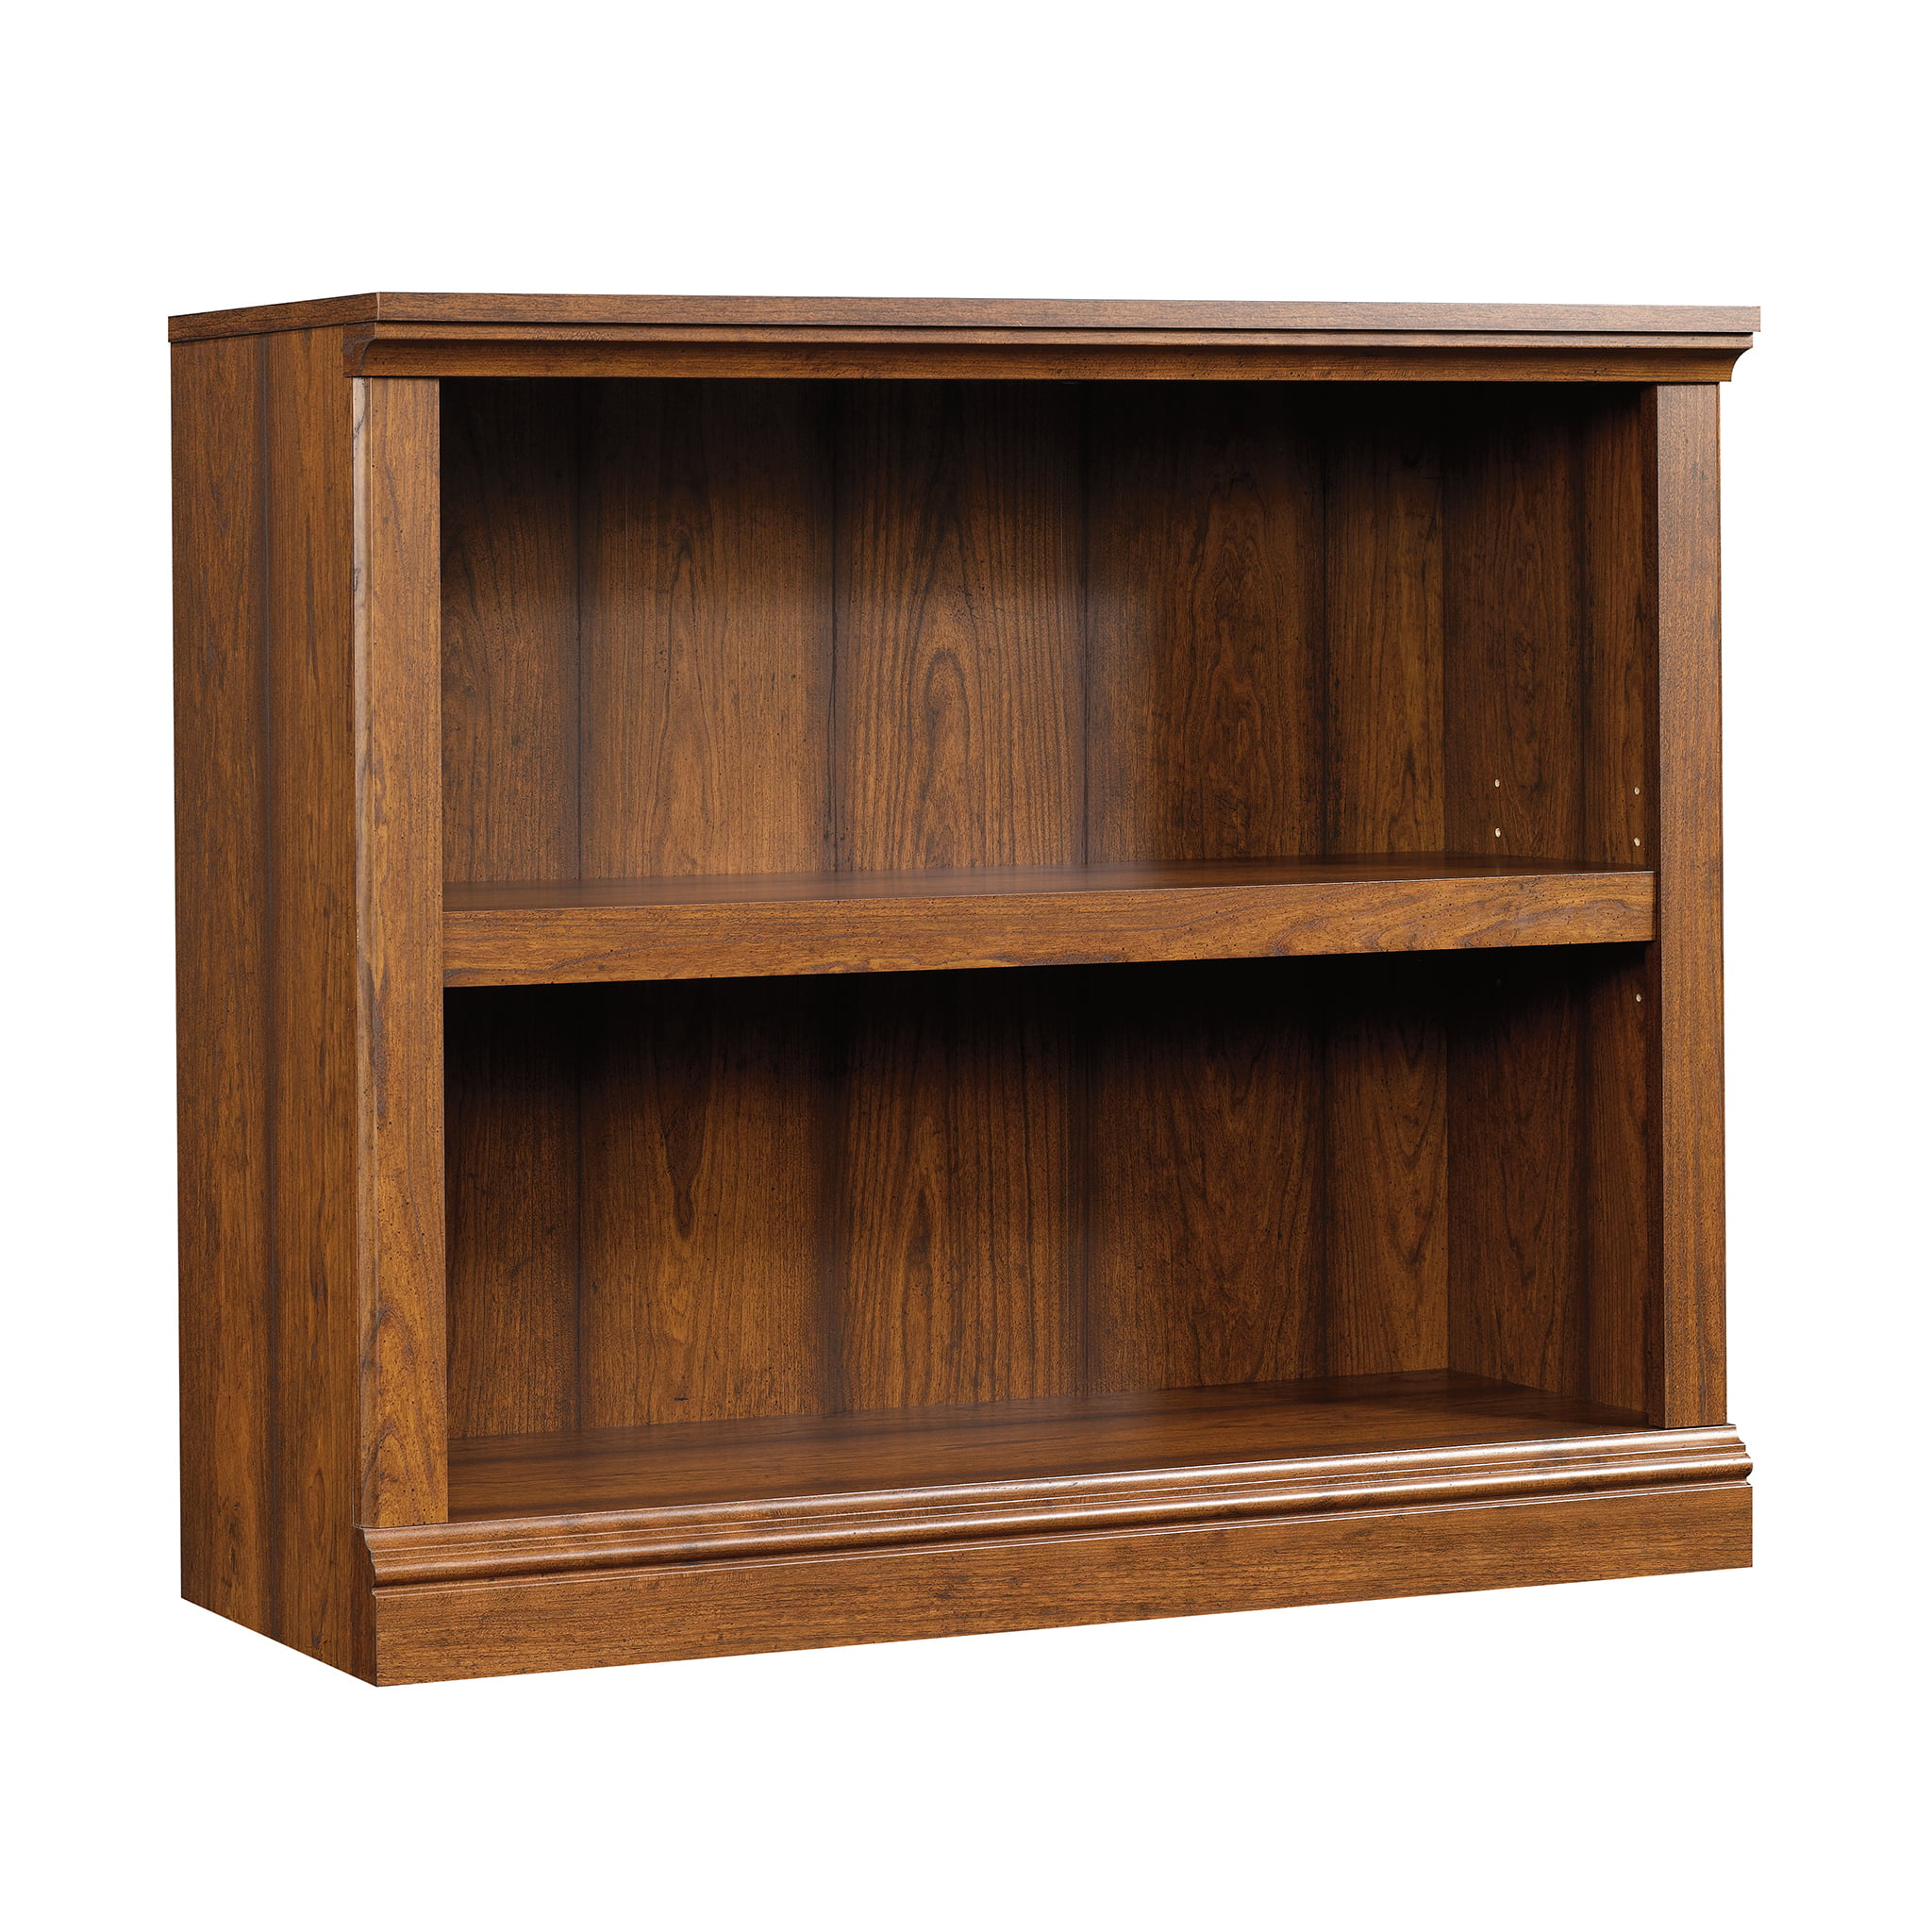 amazon dp white beginnings shelf ca home bookcase enclosed kitchen bookcases sauder soft